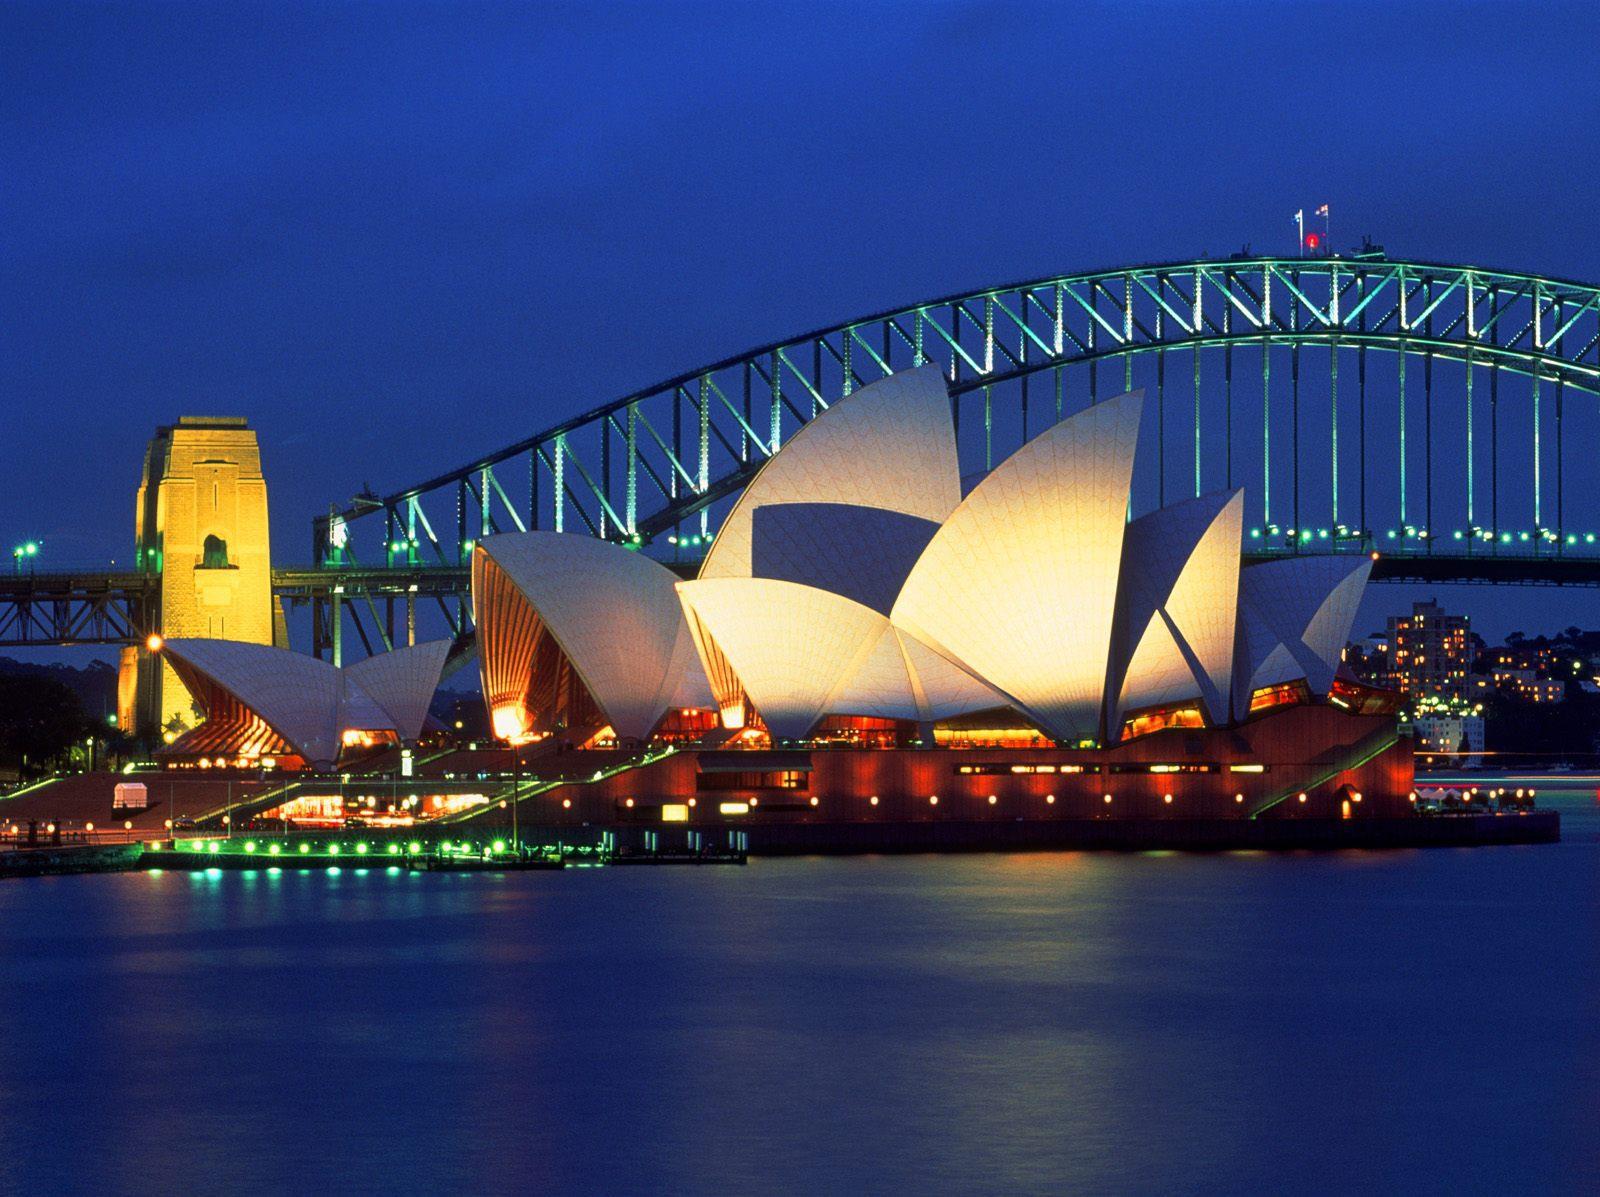 Hotels near Sydney Australia